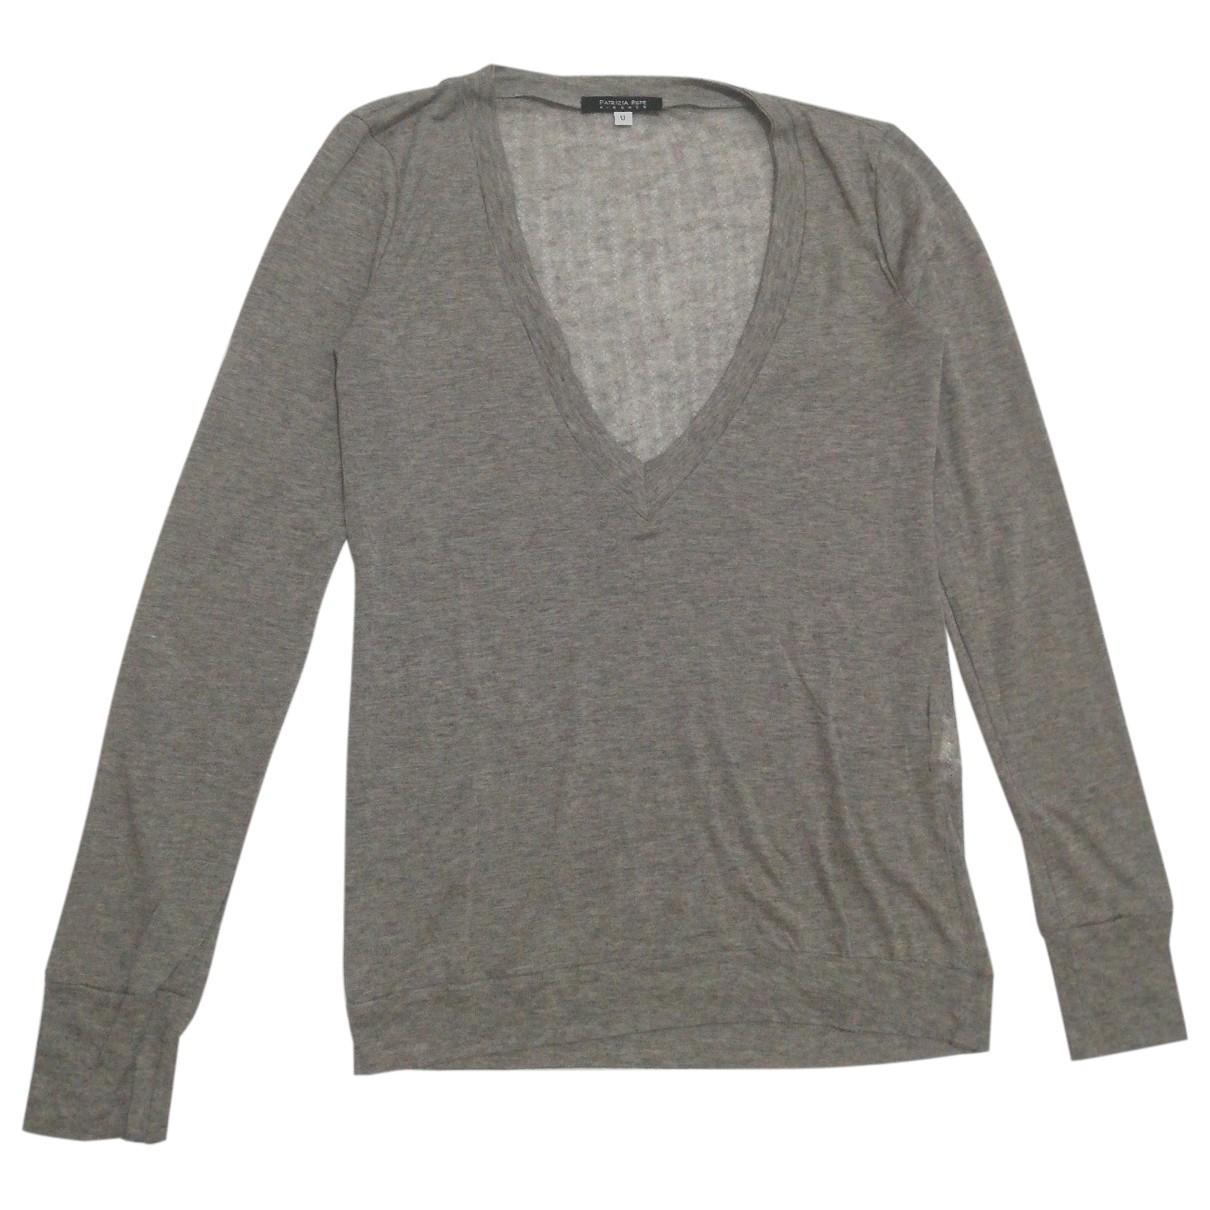 Patrizia Pepe \N Grey Wool  top for Women One Size FR